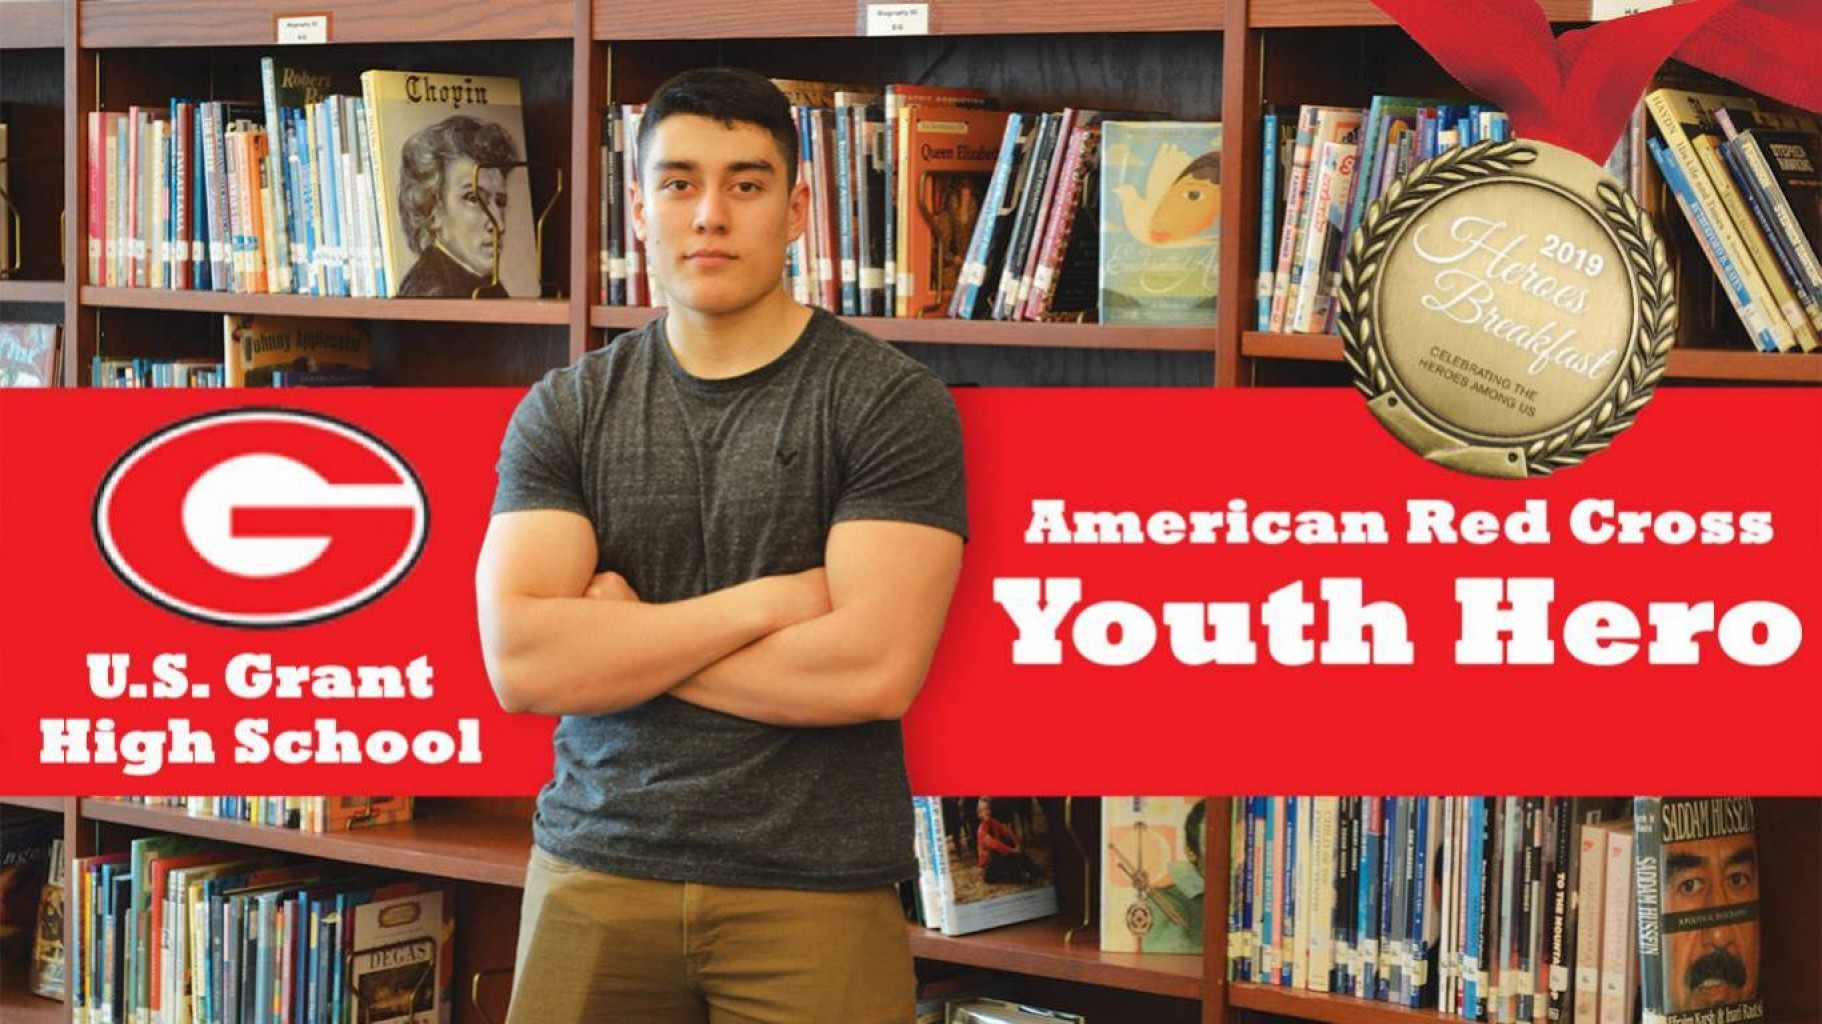 American Red Cross Youth Hero